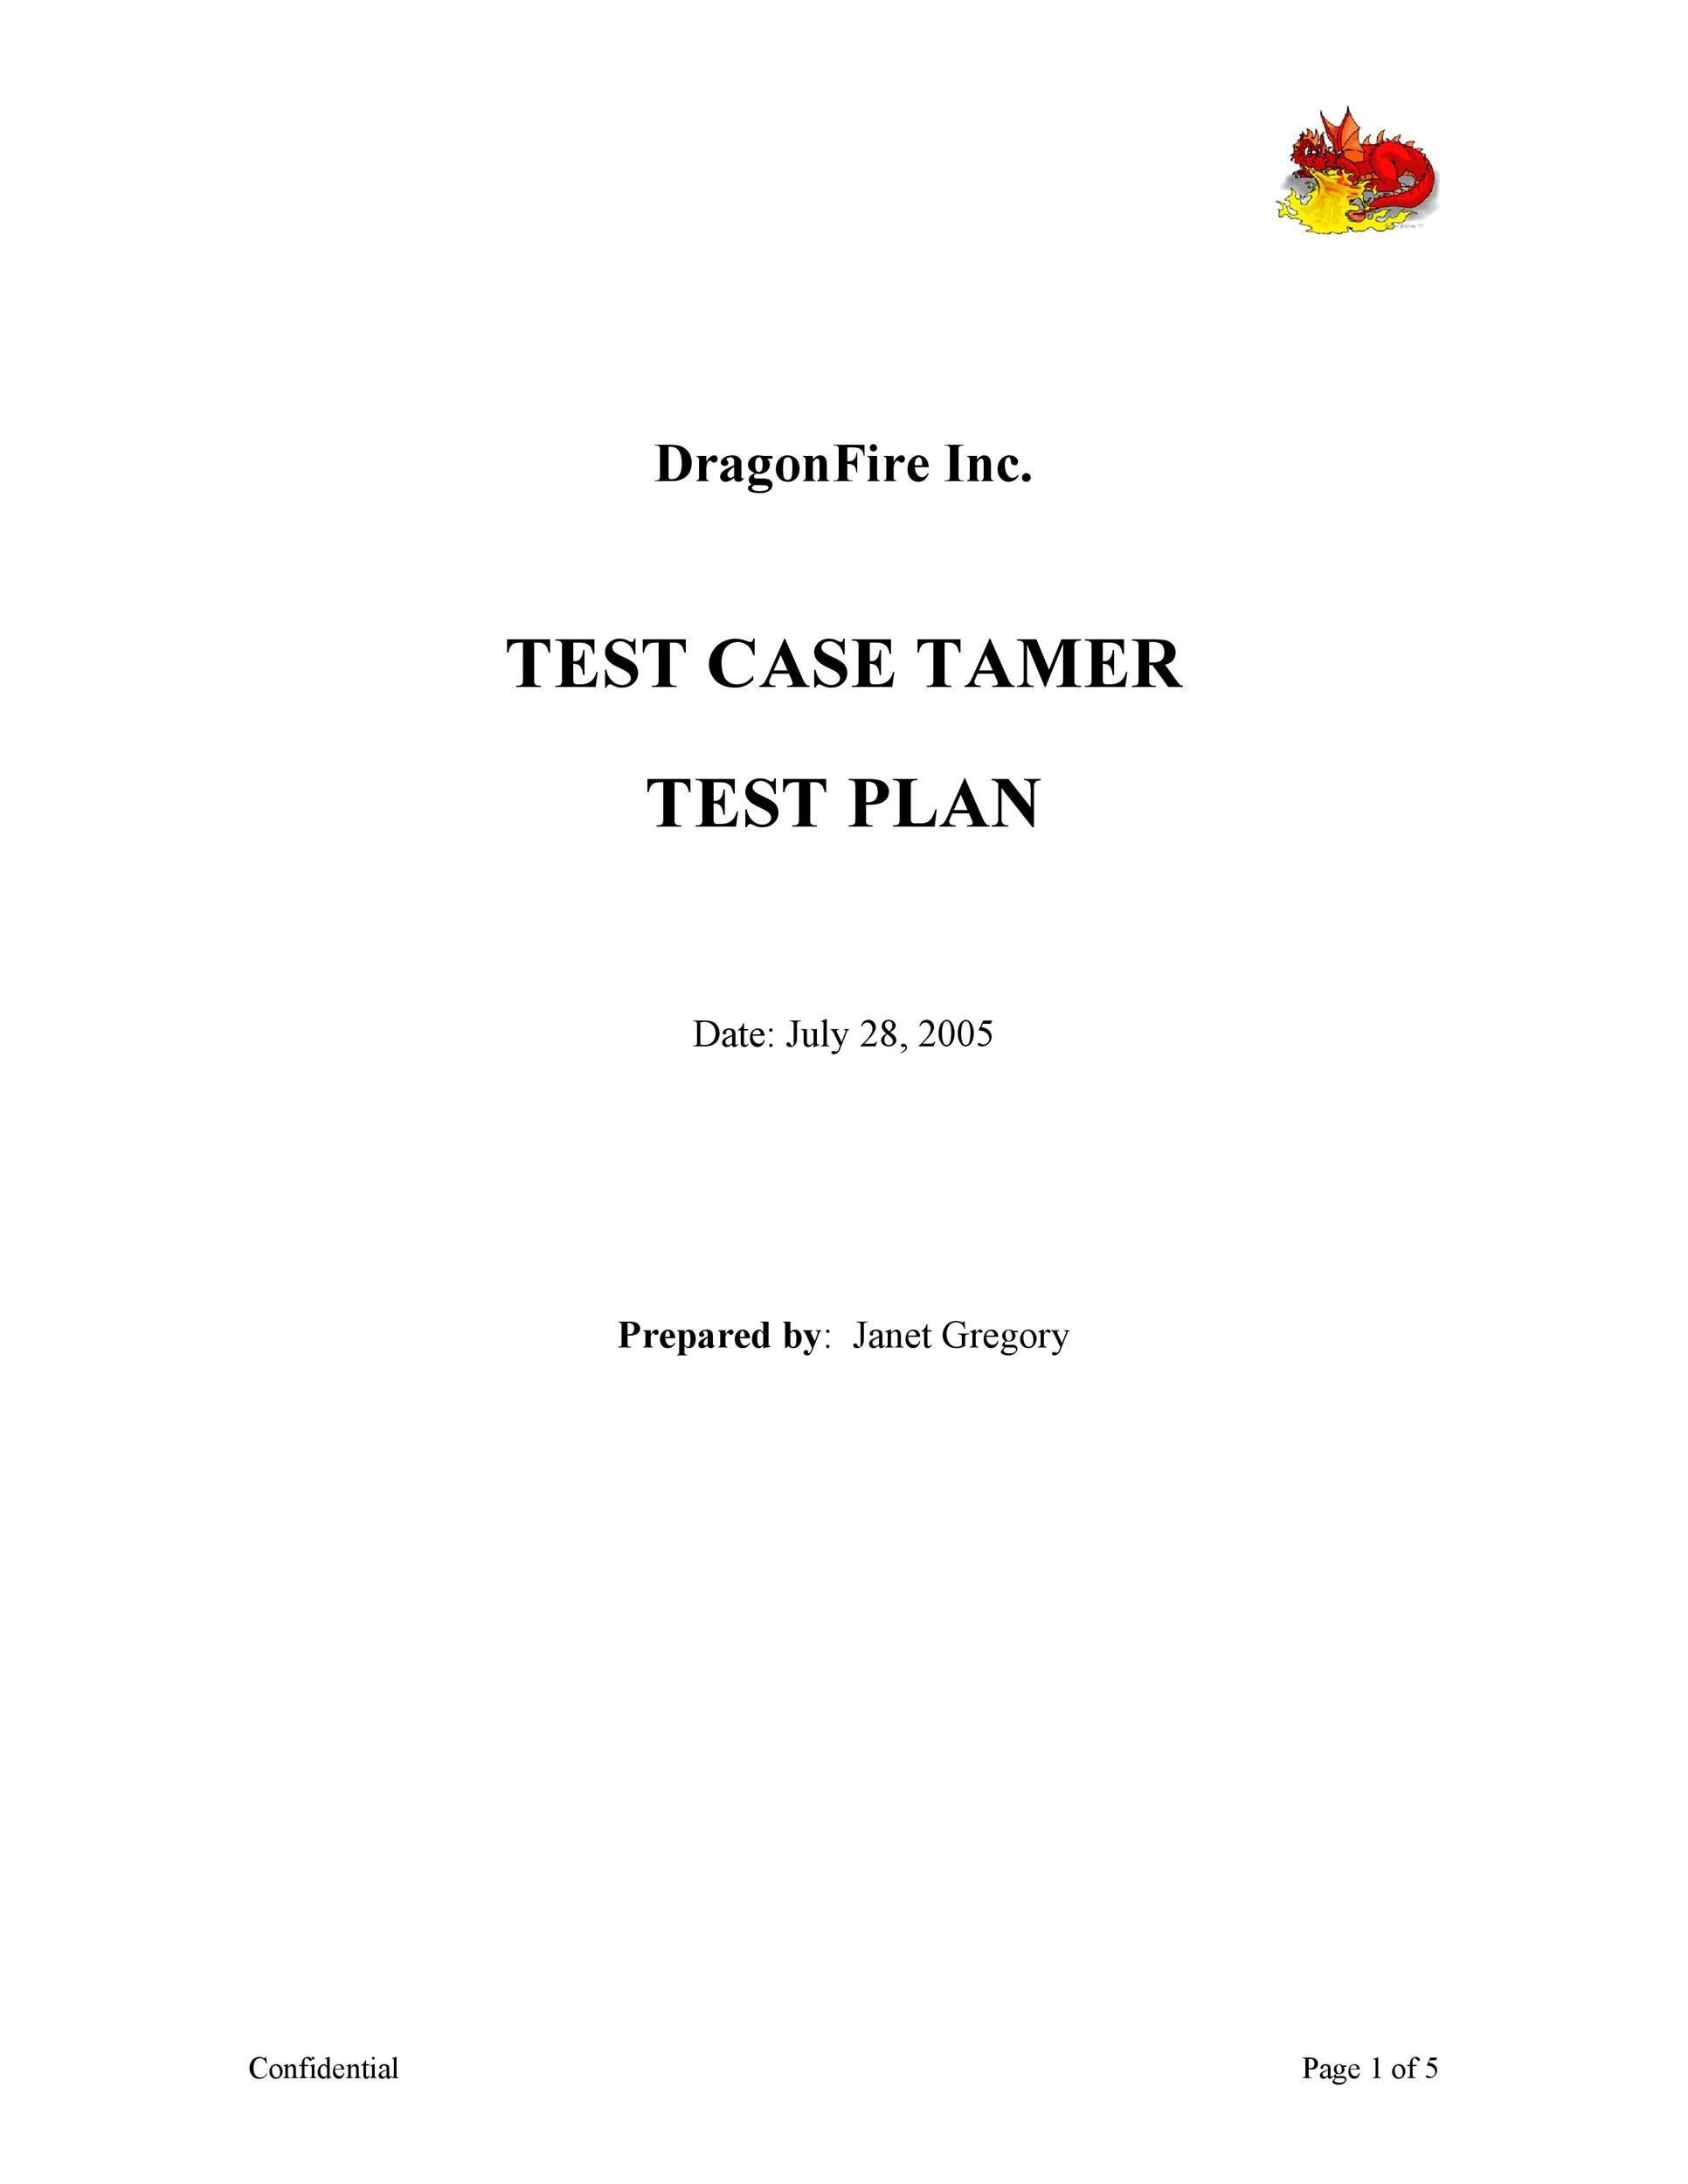 Free Test Plan Template 11